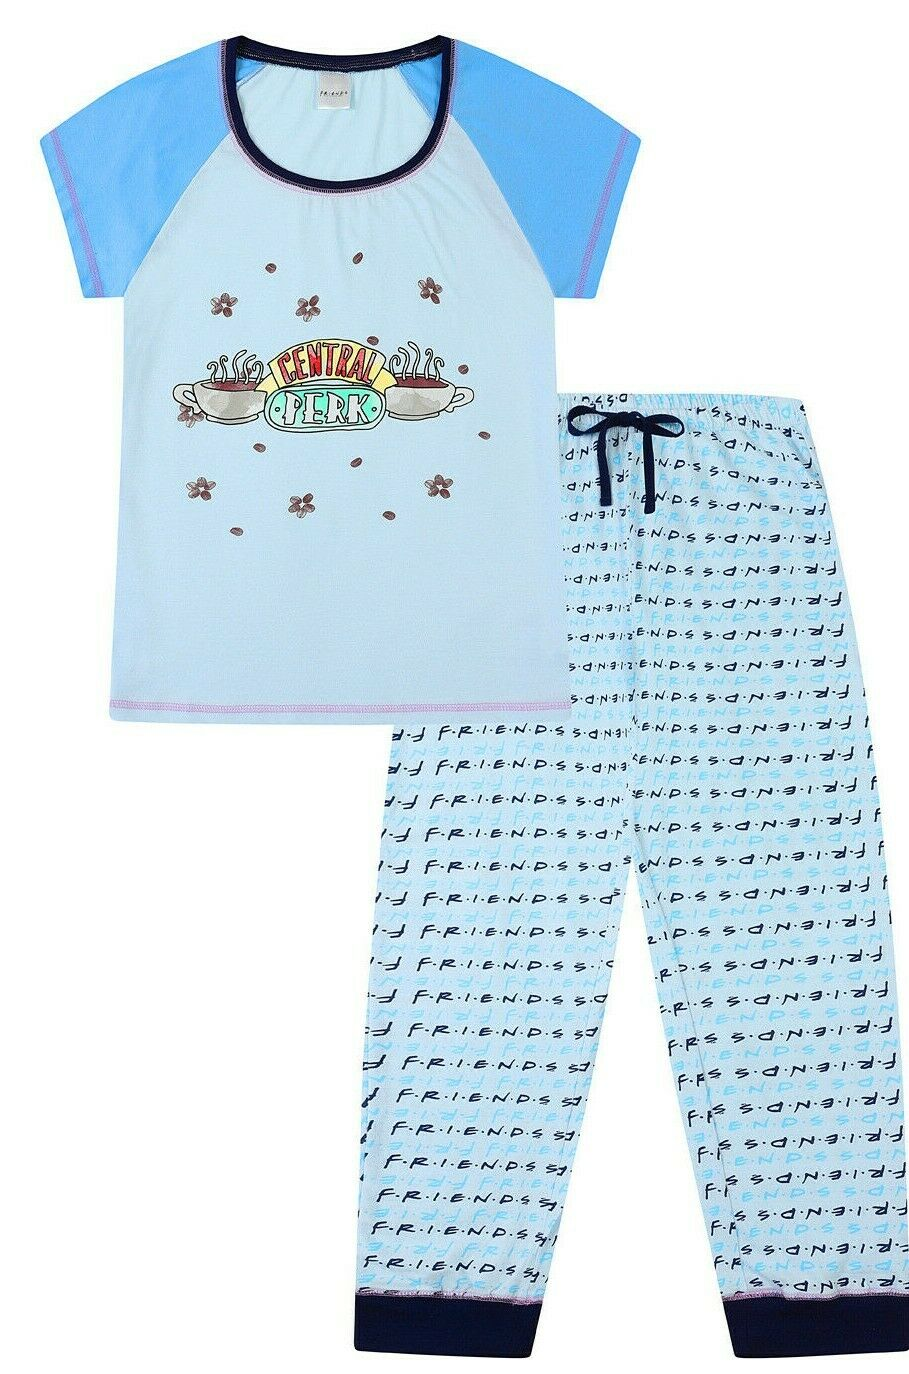 FRIENDS Central Perk Pyjamas for Women's Cafe TV Show Ladies PJ Set Blue